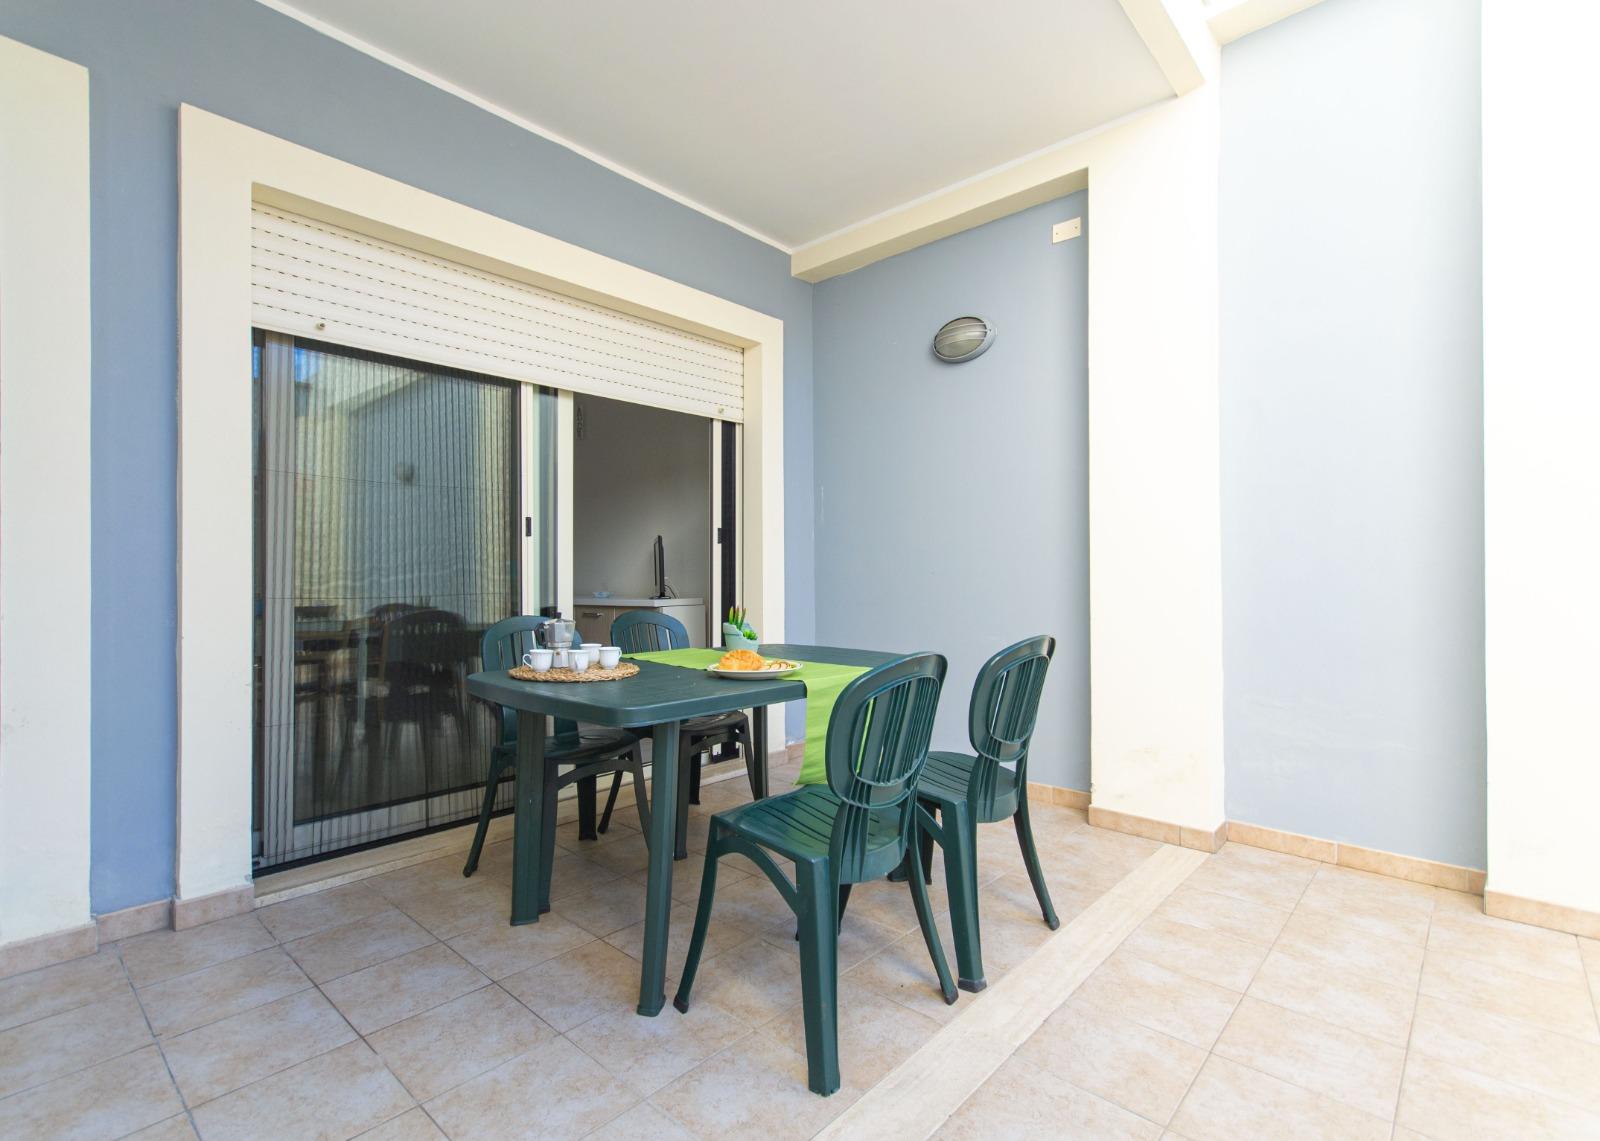 505_appartamento-volta_3._veranda.jpg